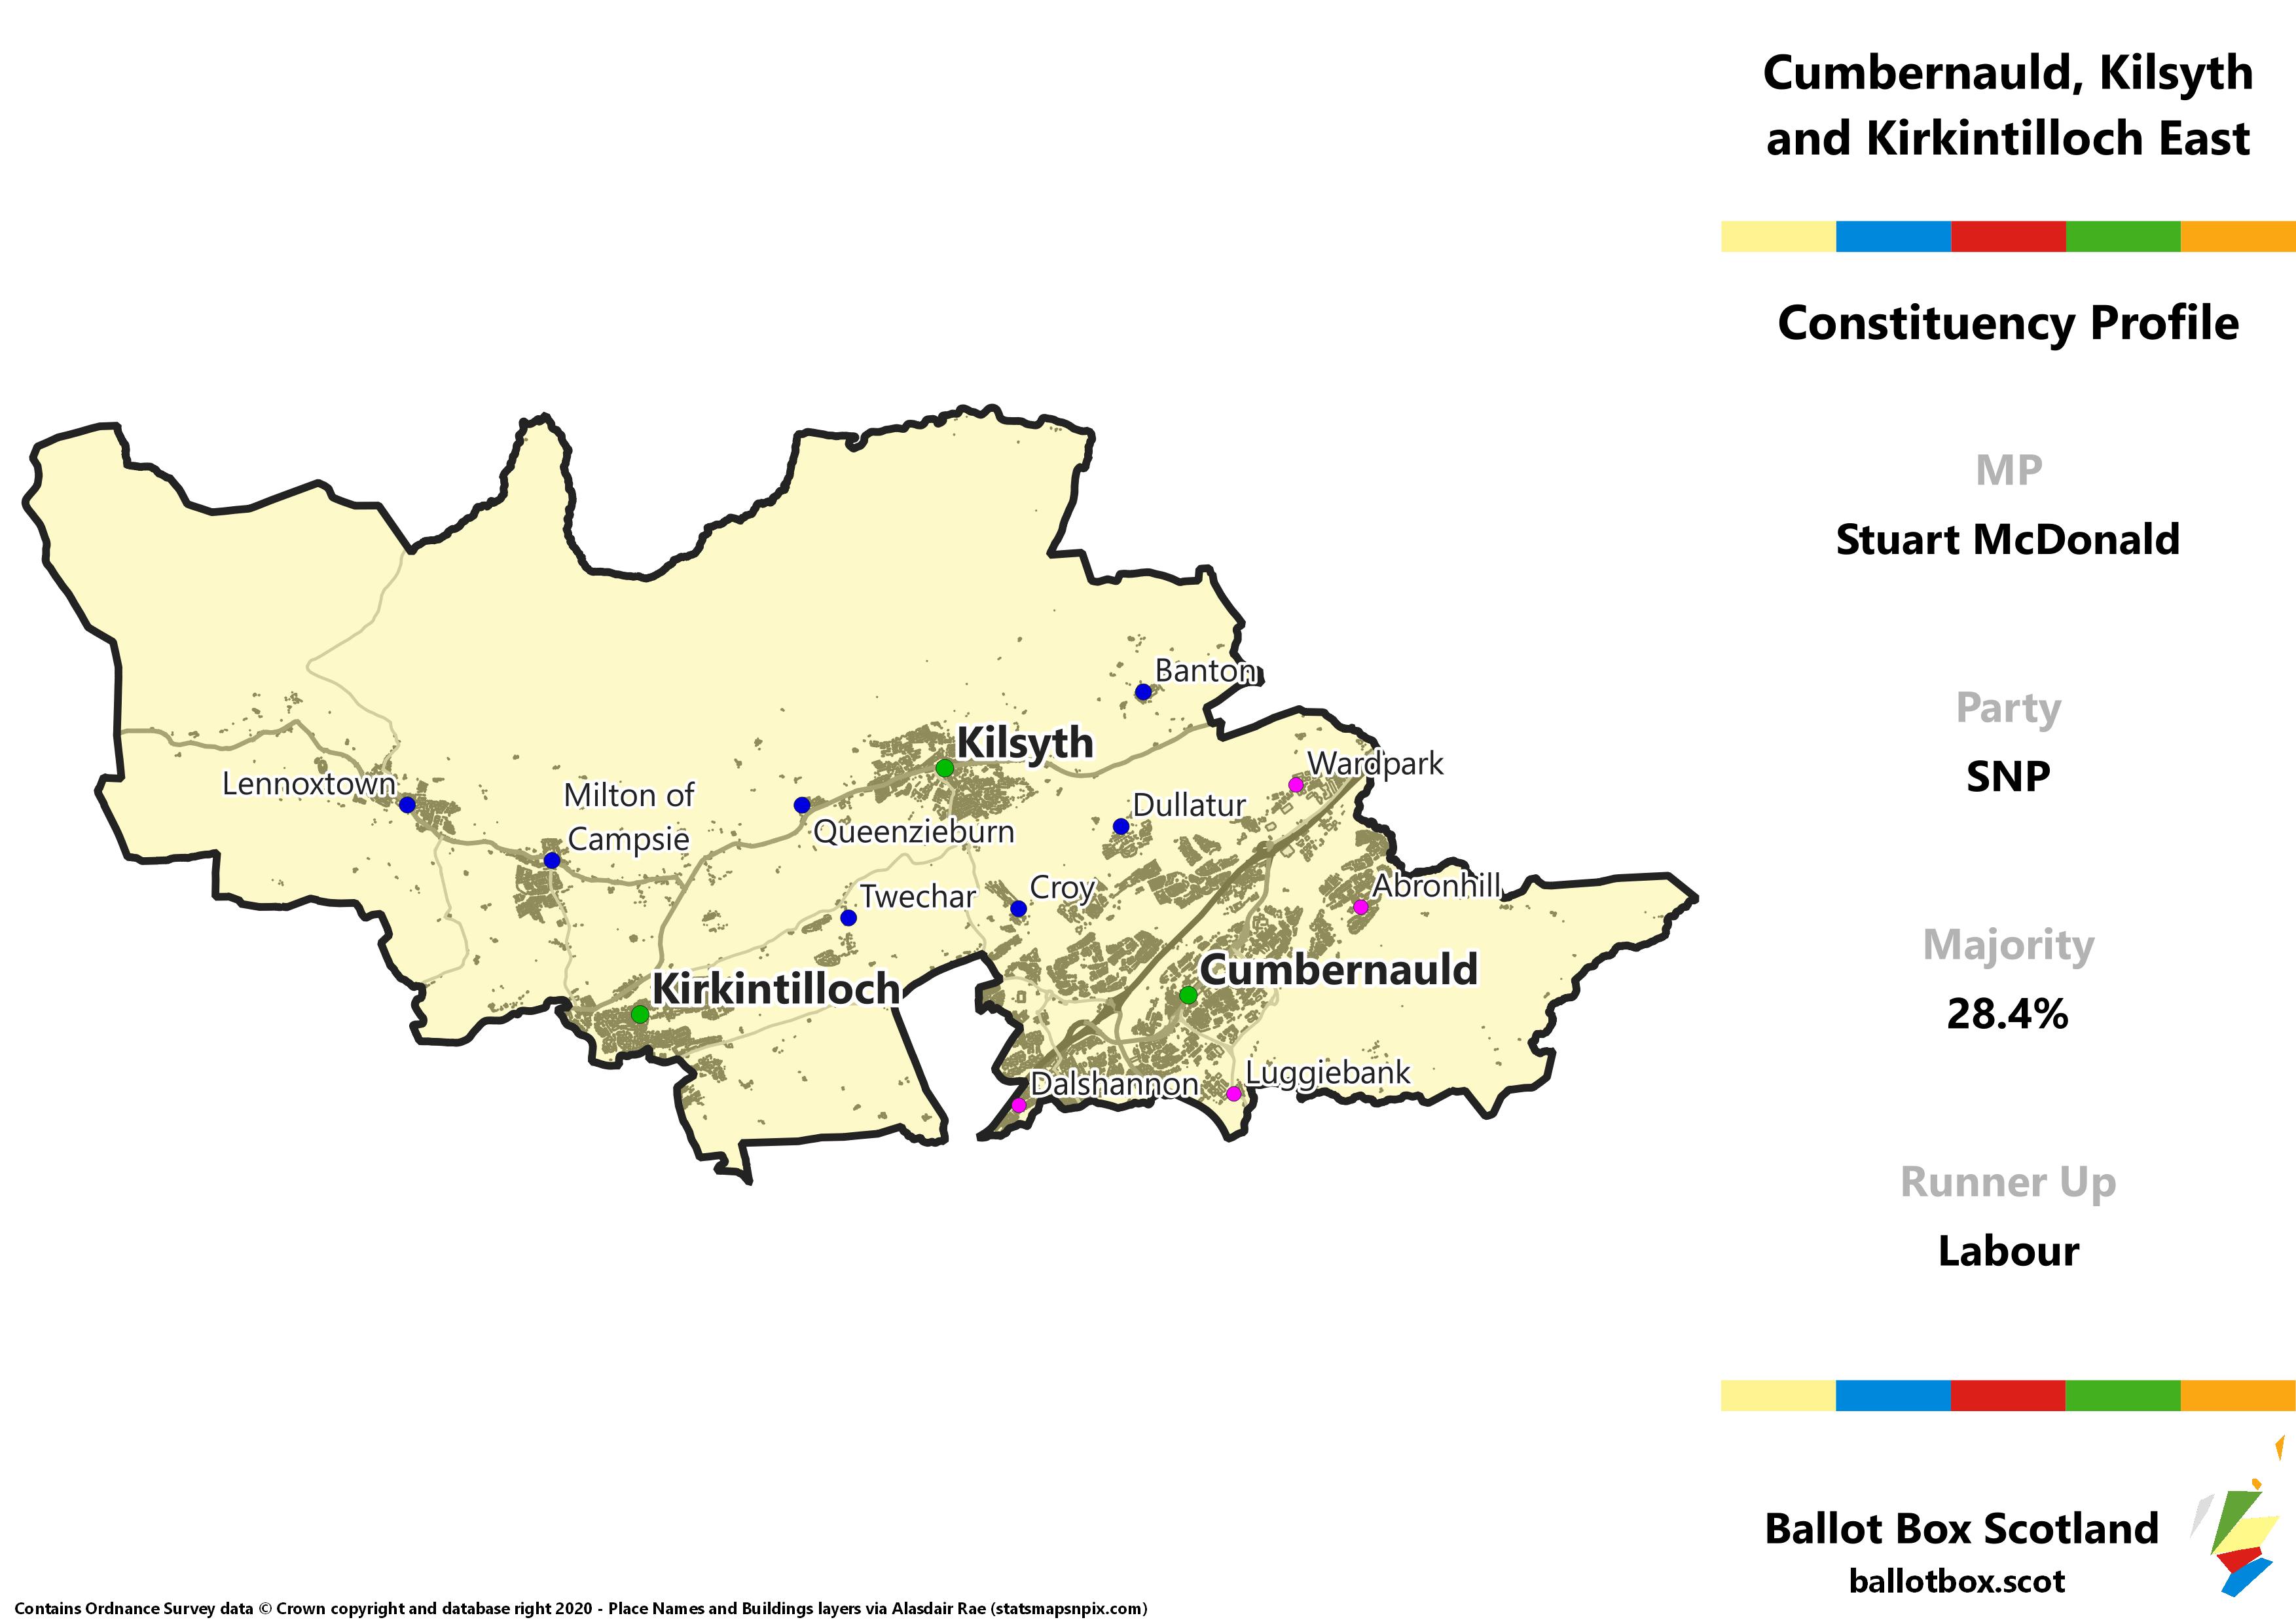 Cumbernauld, Kilsyth and Kirkintilloch East Constituency Map